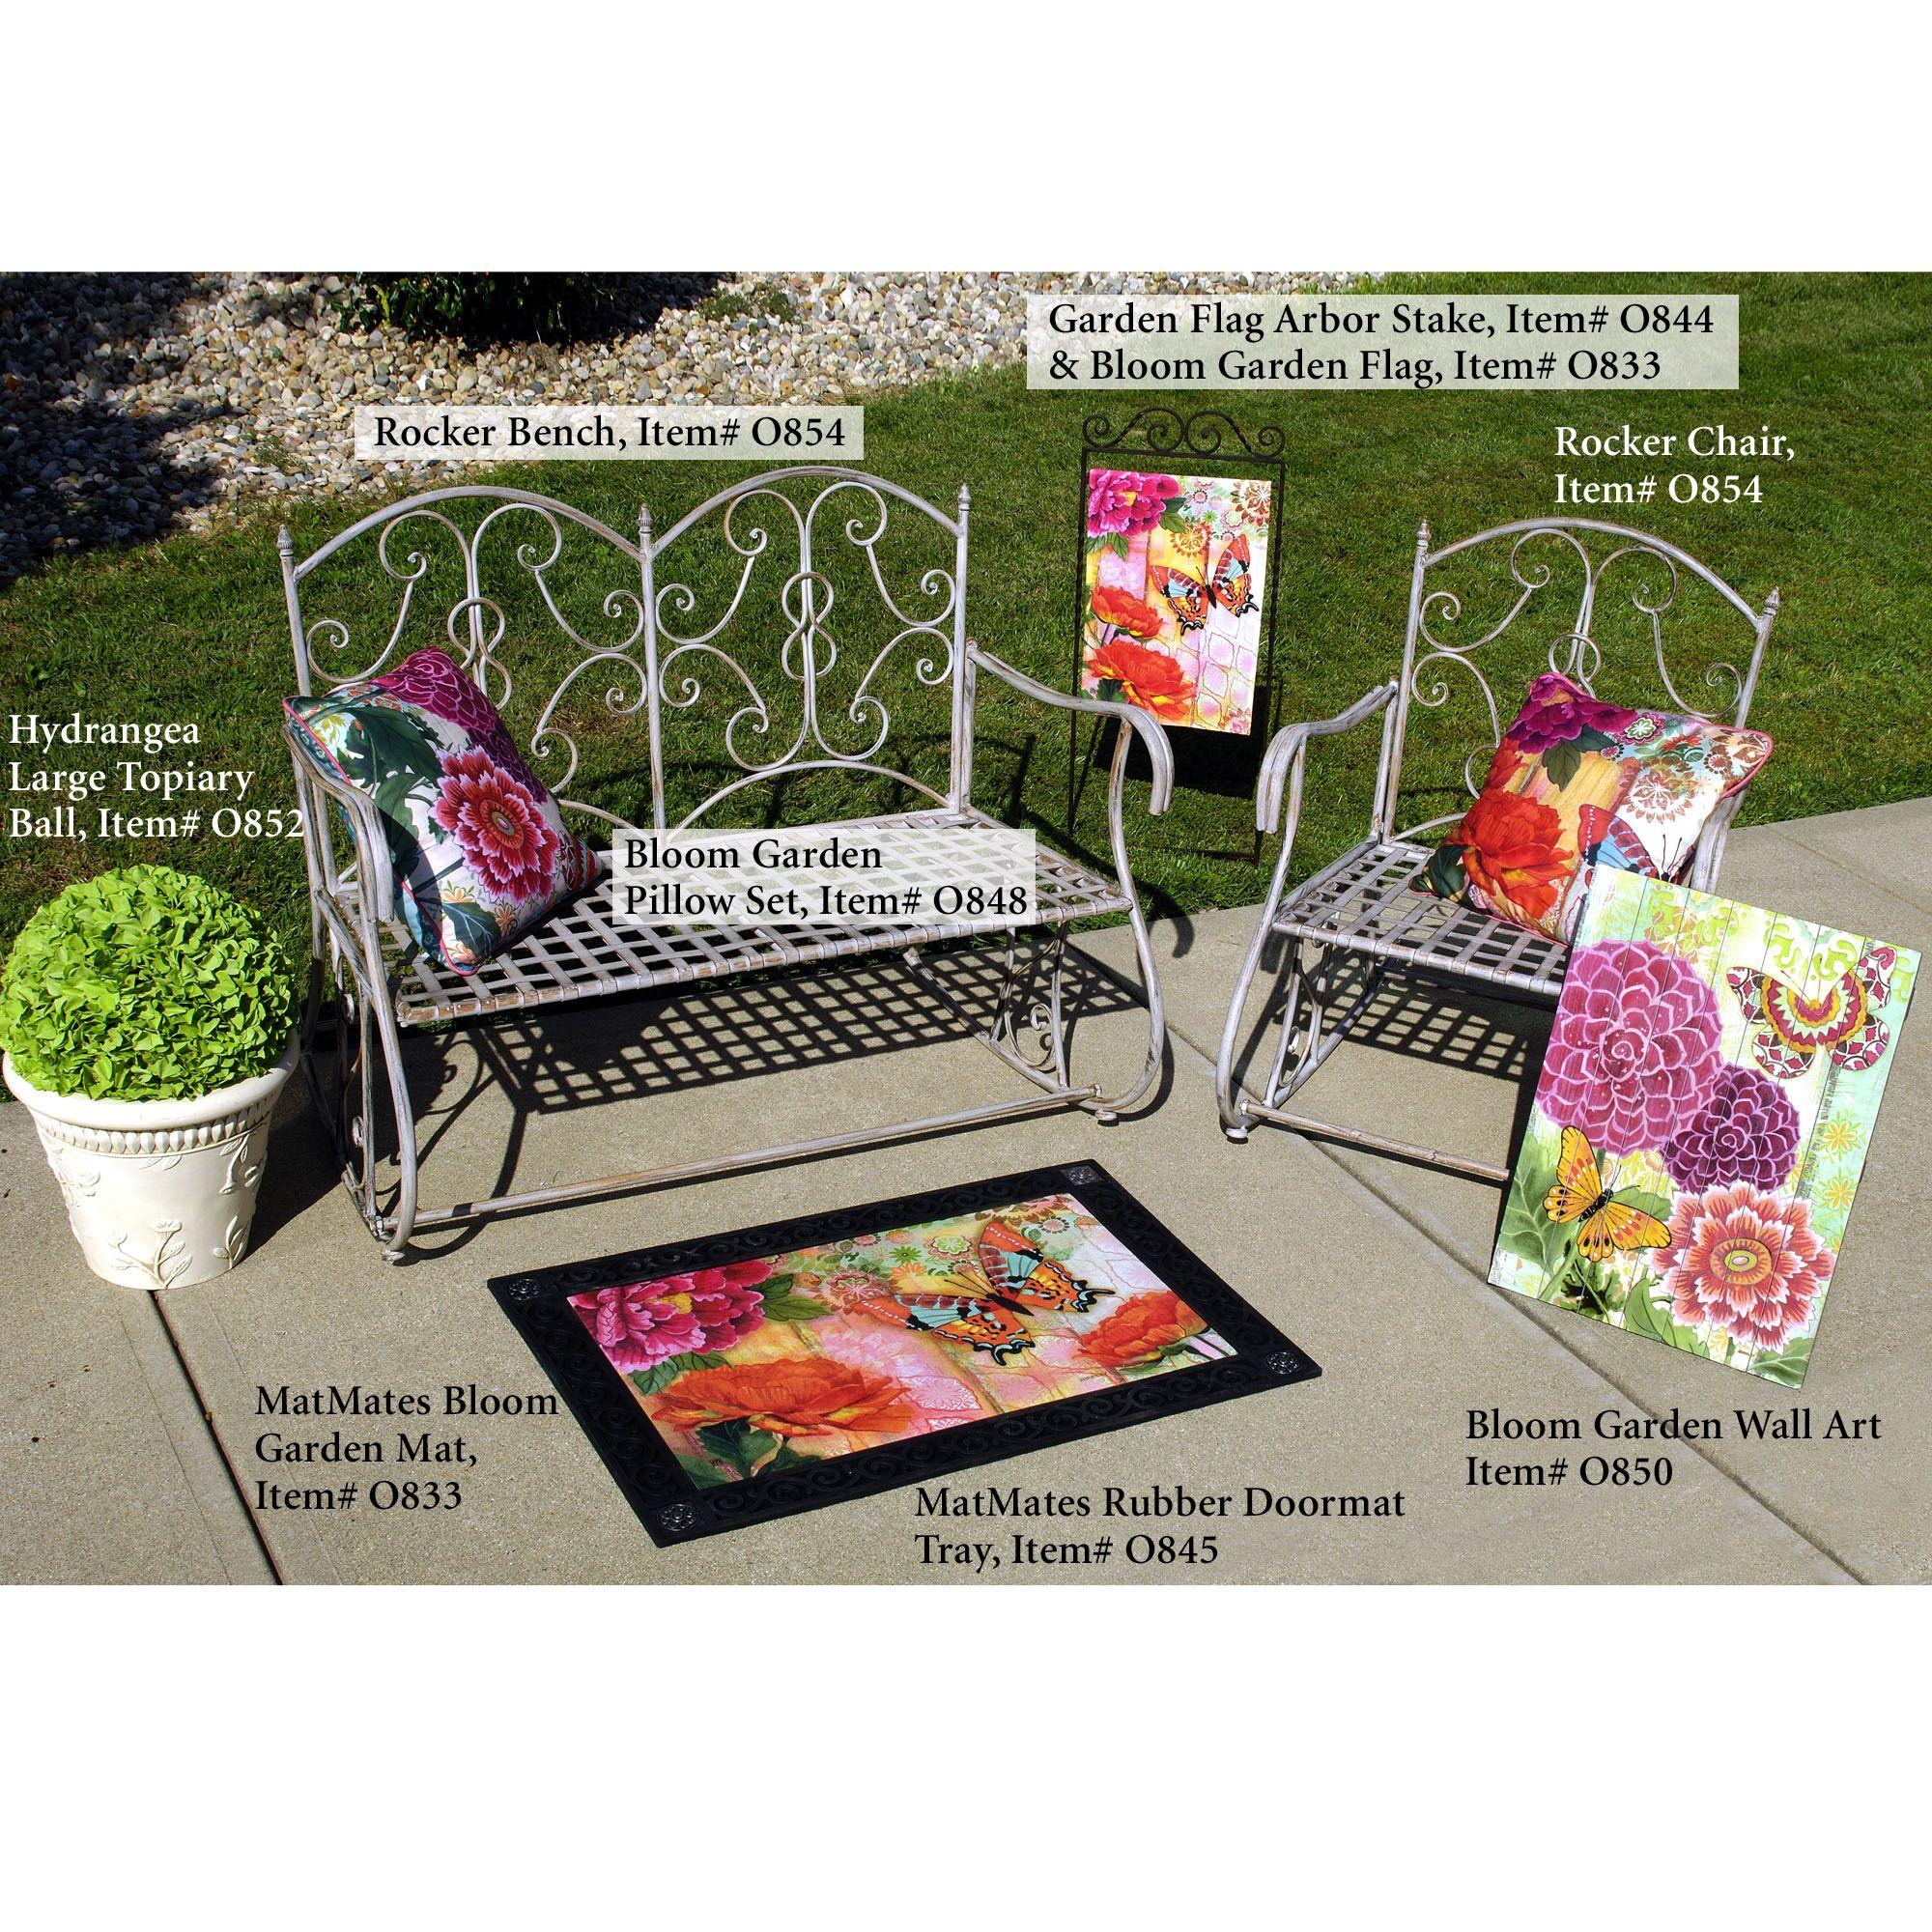 Bloom garden brinley collection landscaping garden ideas